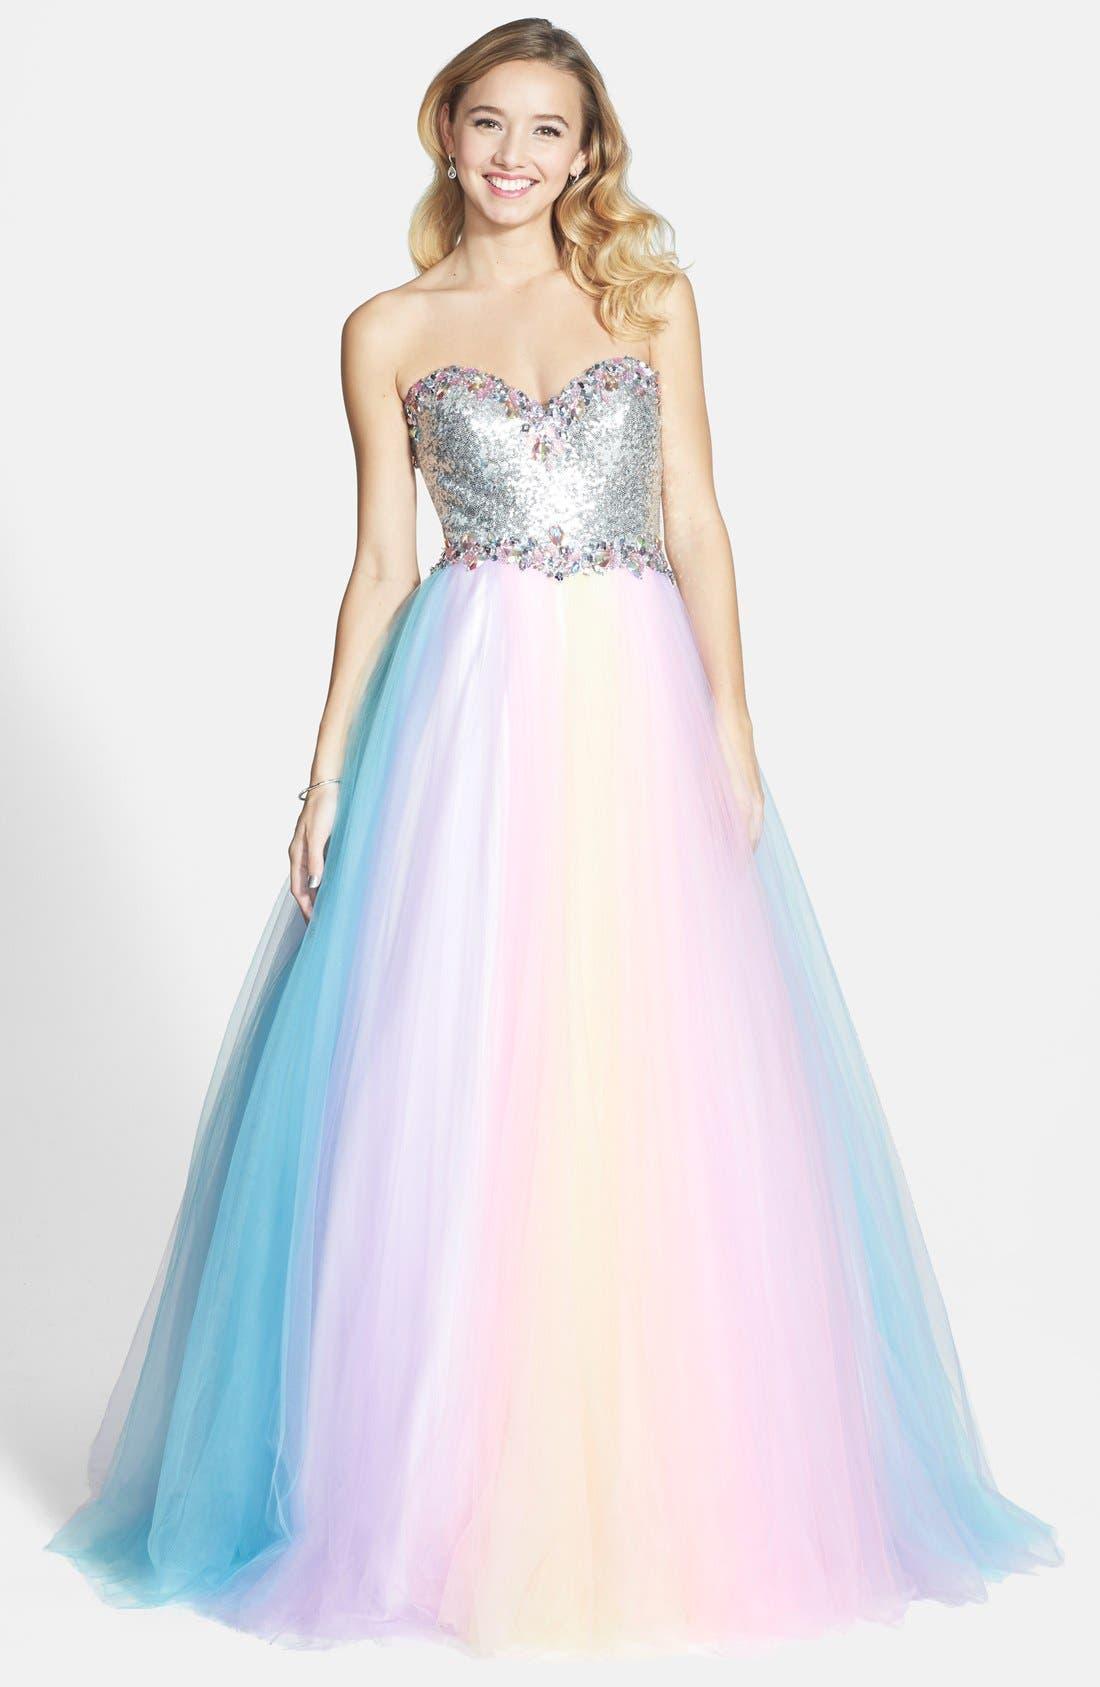 Main Image - Mac Duggal Rainbow Gown